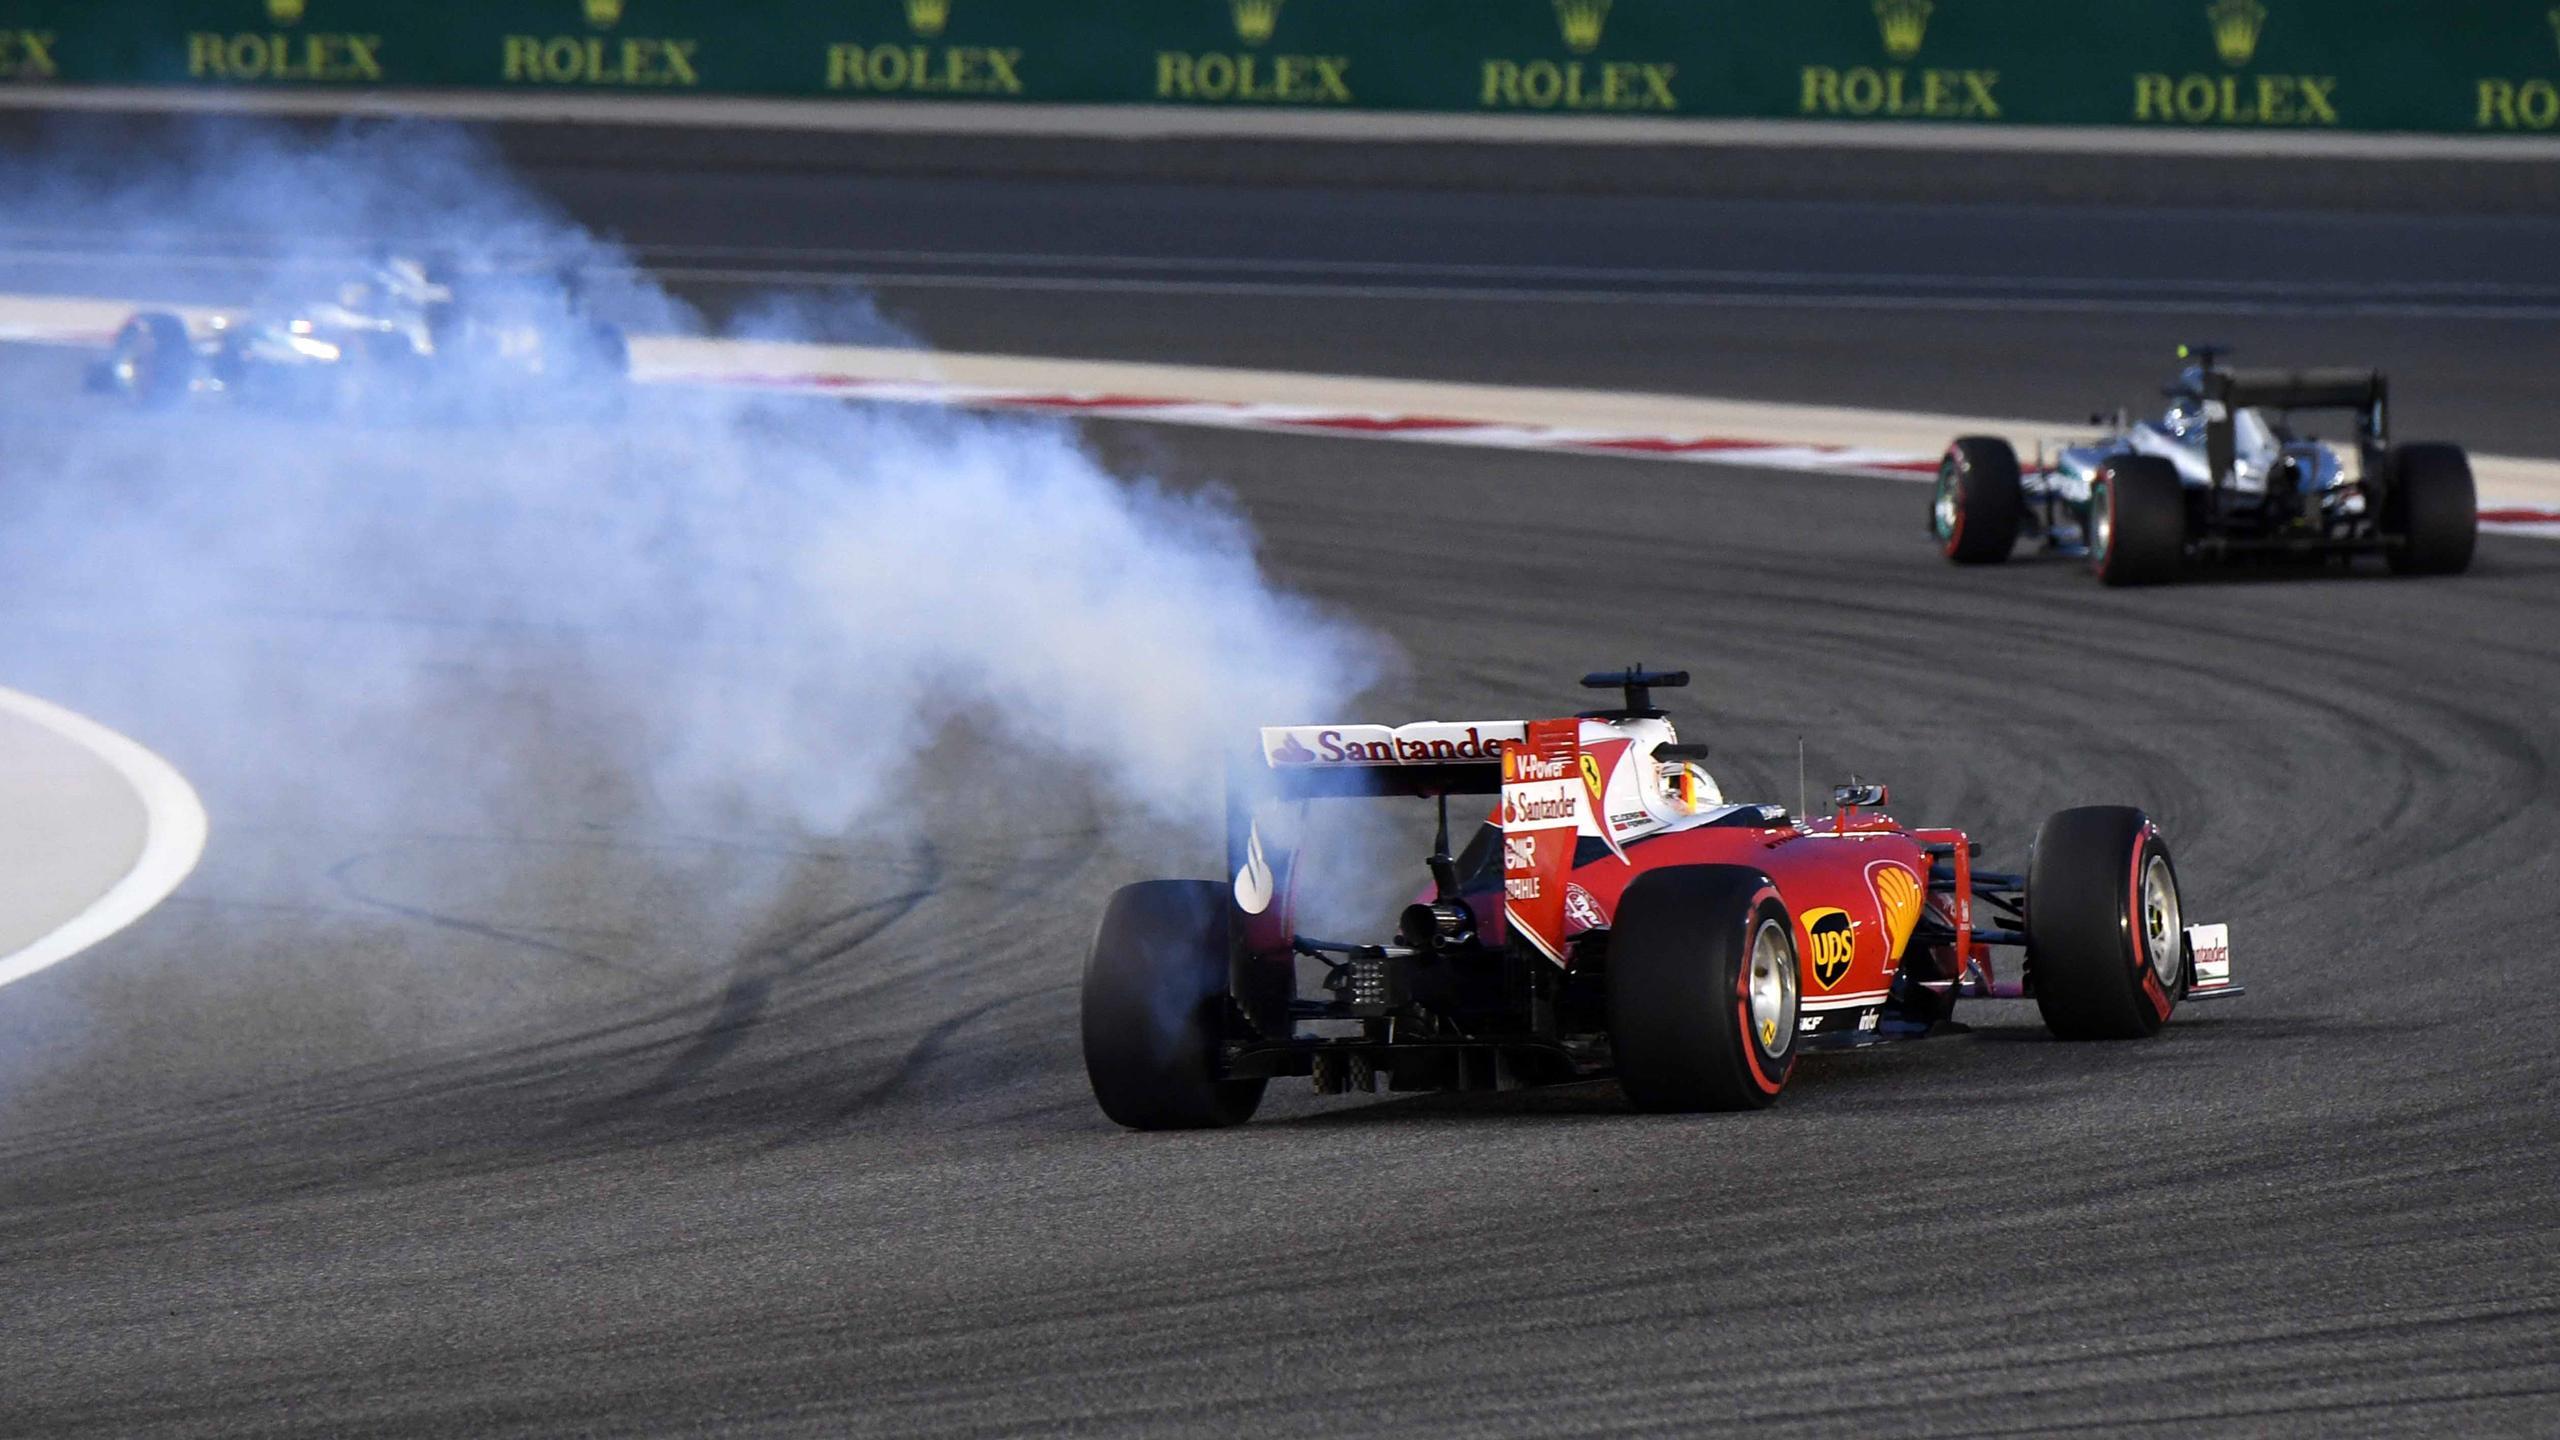 Sebastian Vettel (Ferrari) au Grand Prix de Bahreïn 2016